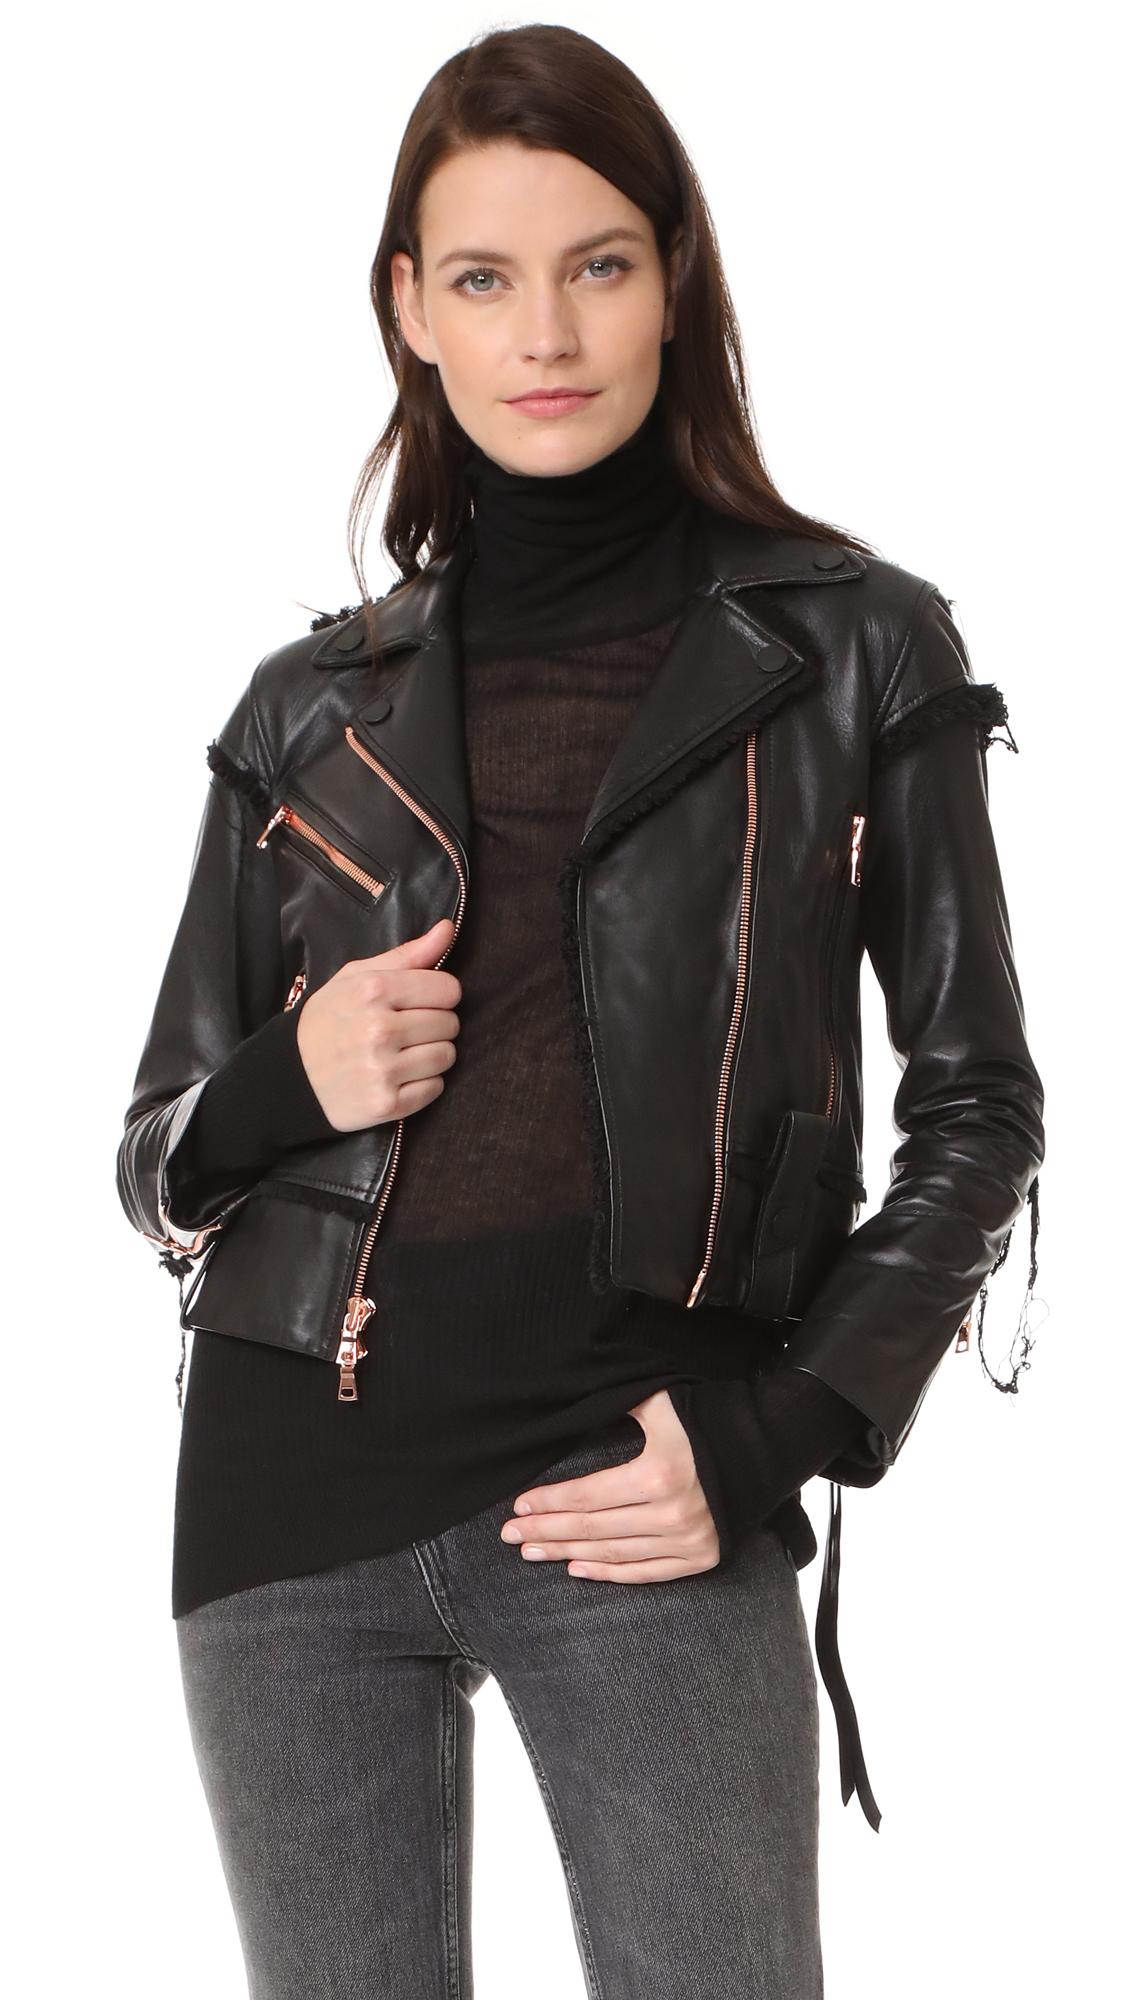 AMKIE Tar Moto Jacket - Black/Rose